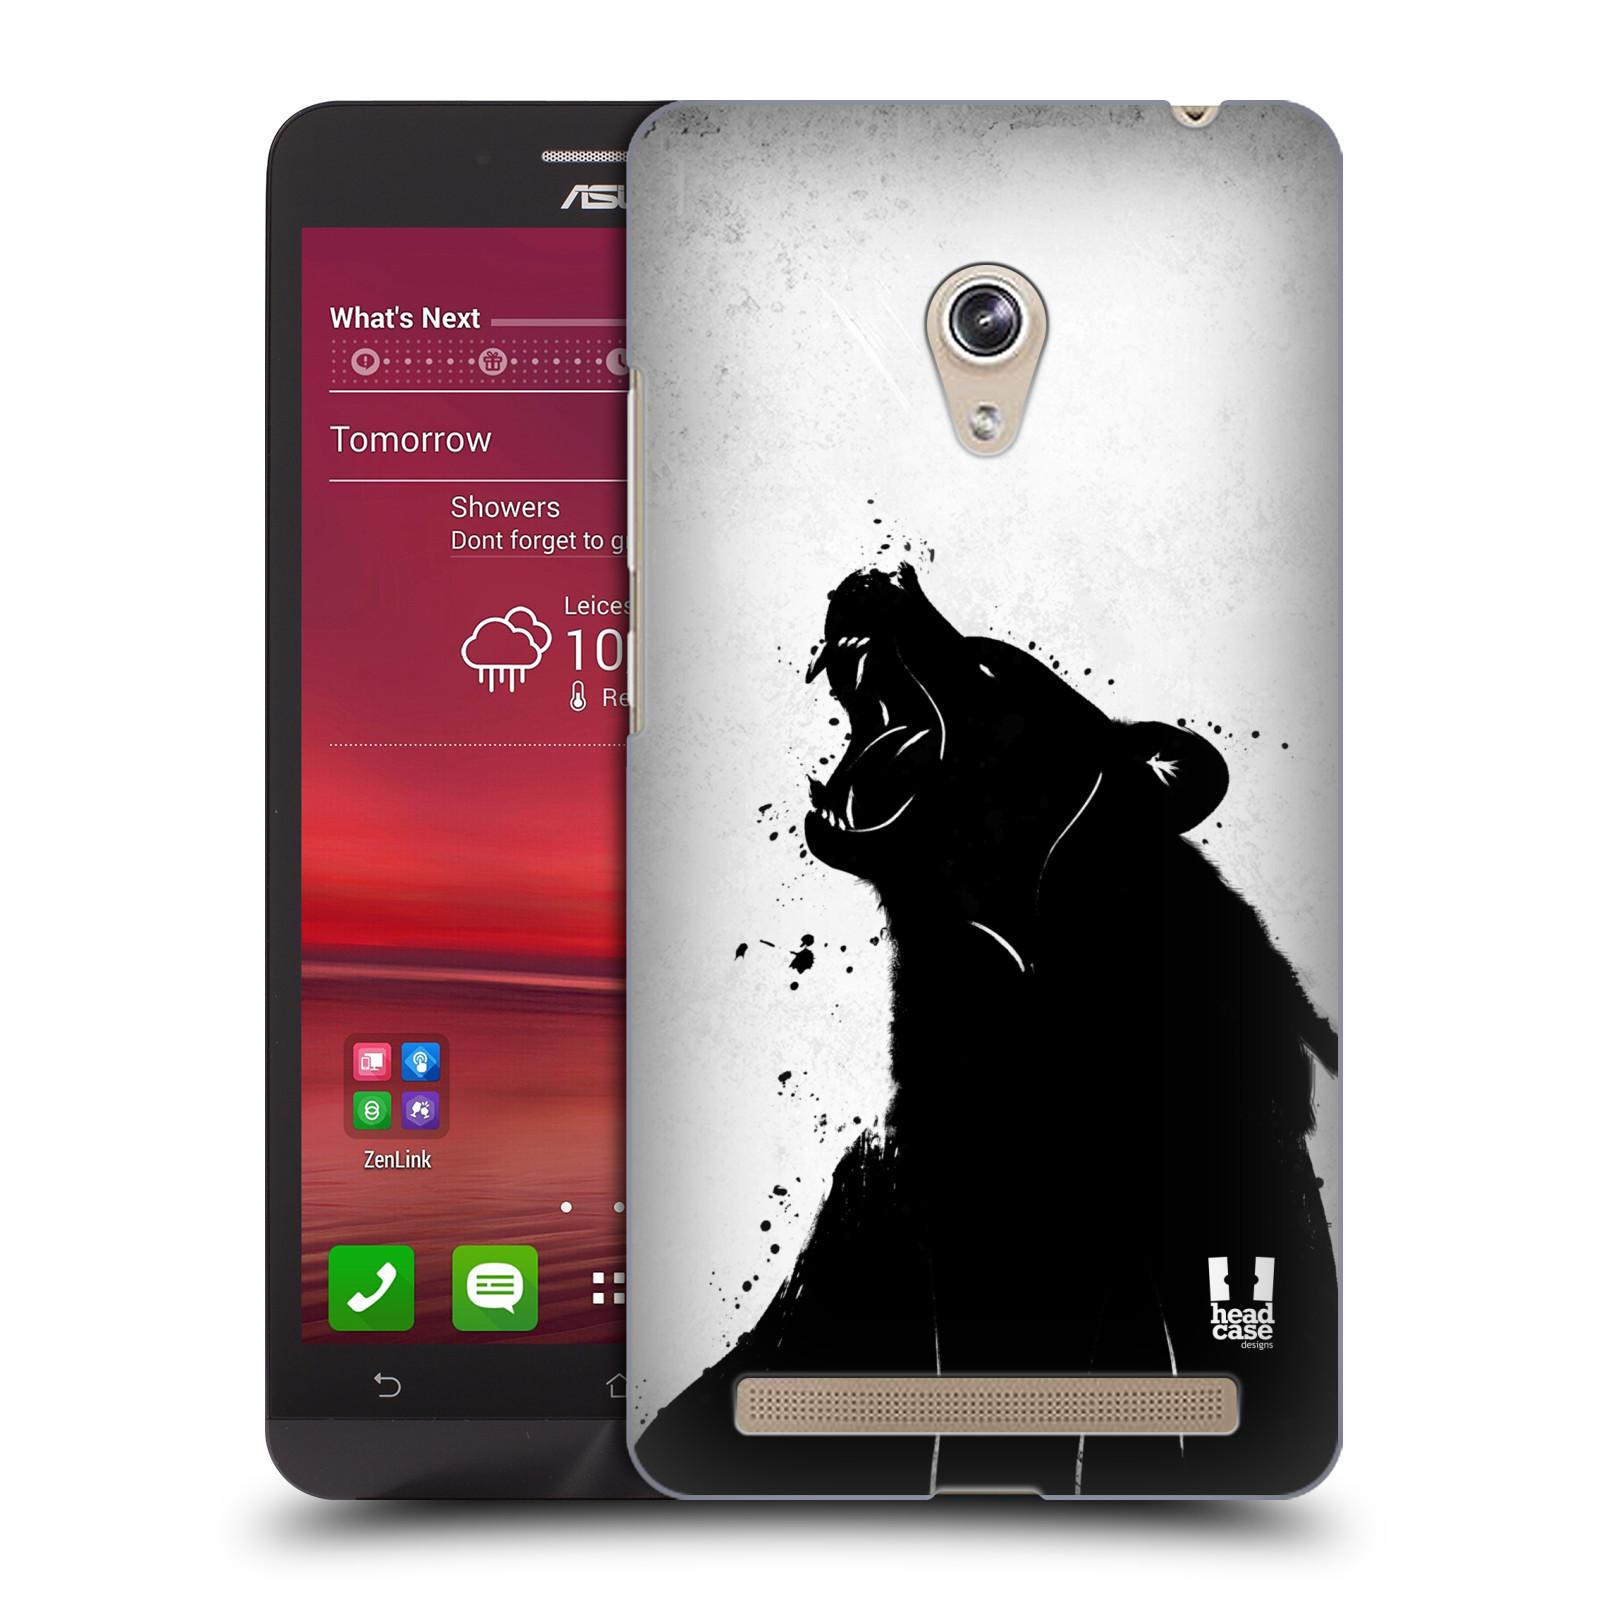 HEAD CASE plastový obal na mobil Asus Zenfone 6 vzor Kresba tuš zvíře medvěd